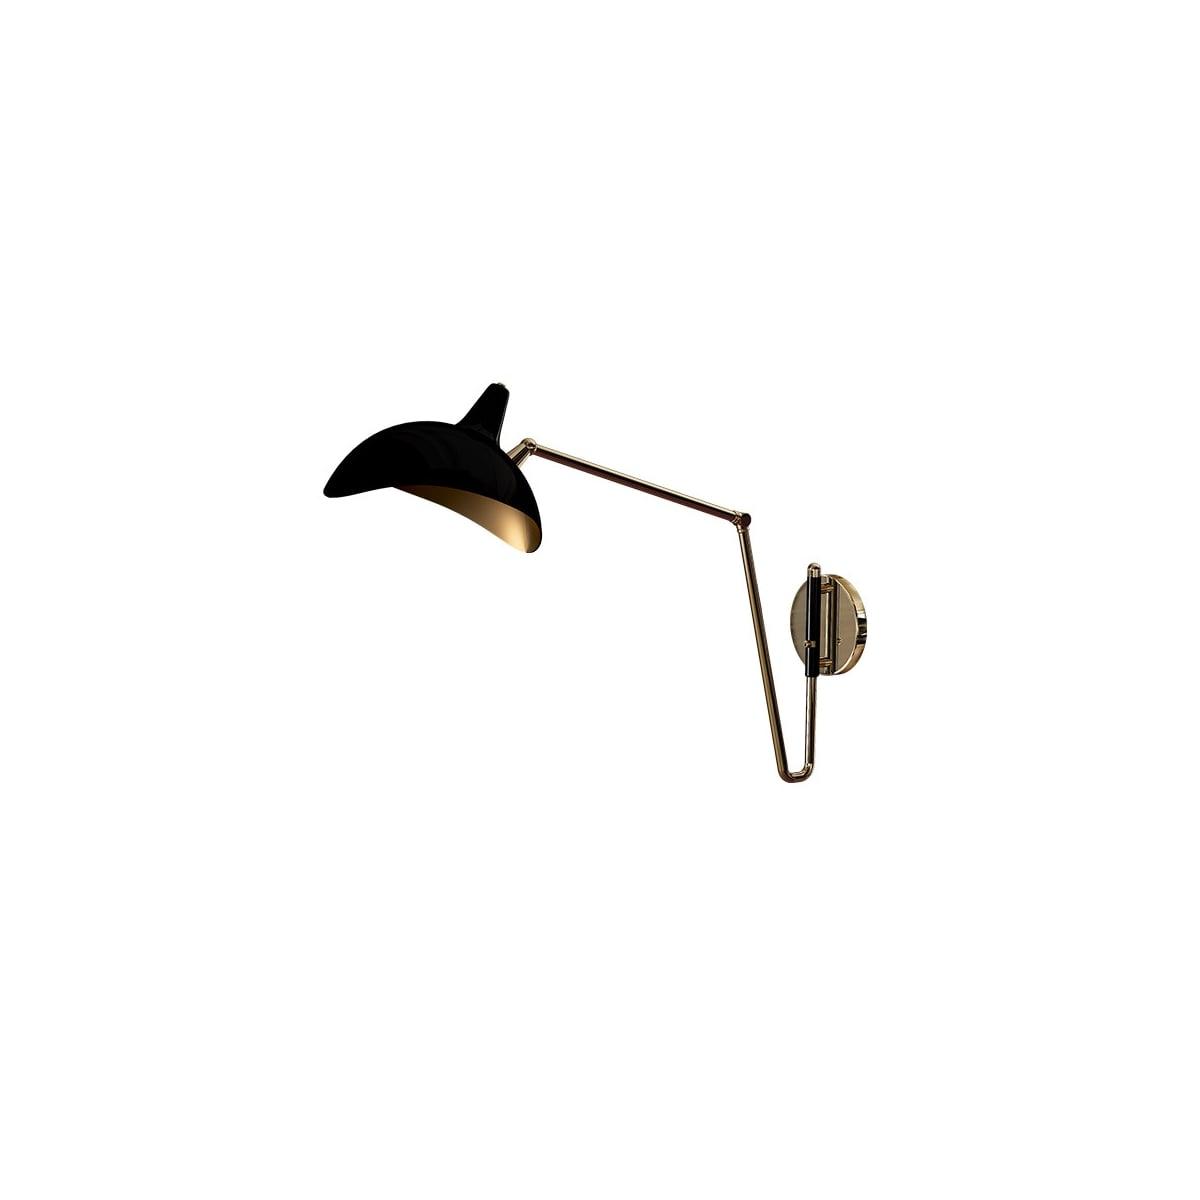 Wall Lights Long Arm : Long Arm Wall Light, Black Chelsea Swanky Interiors